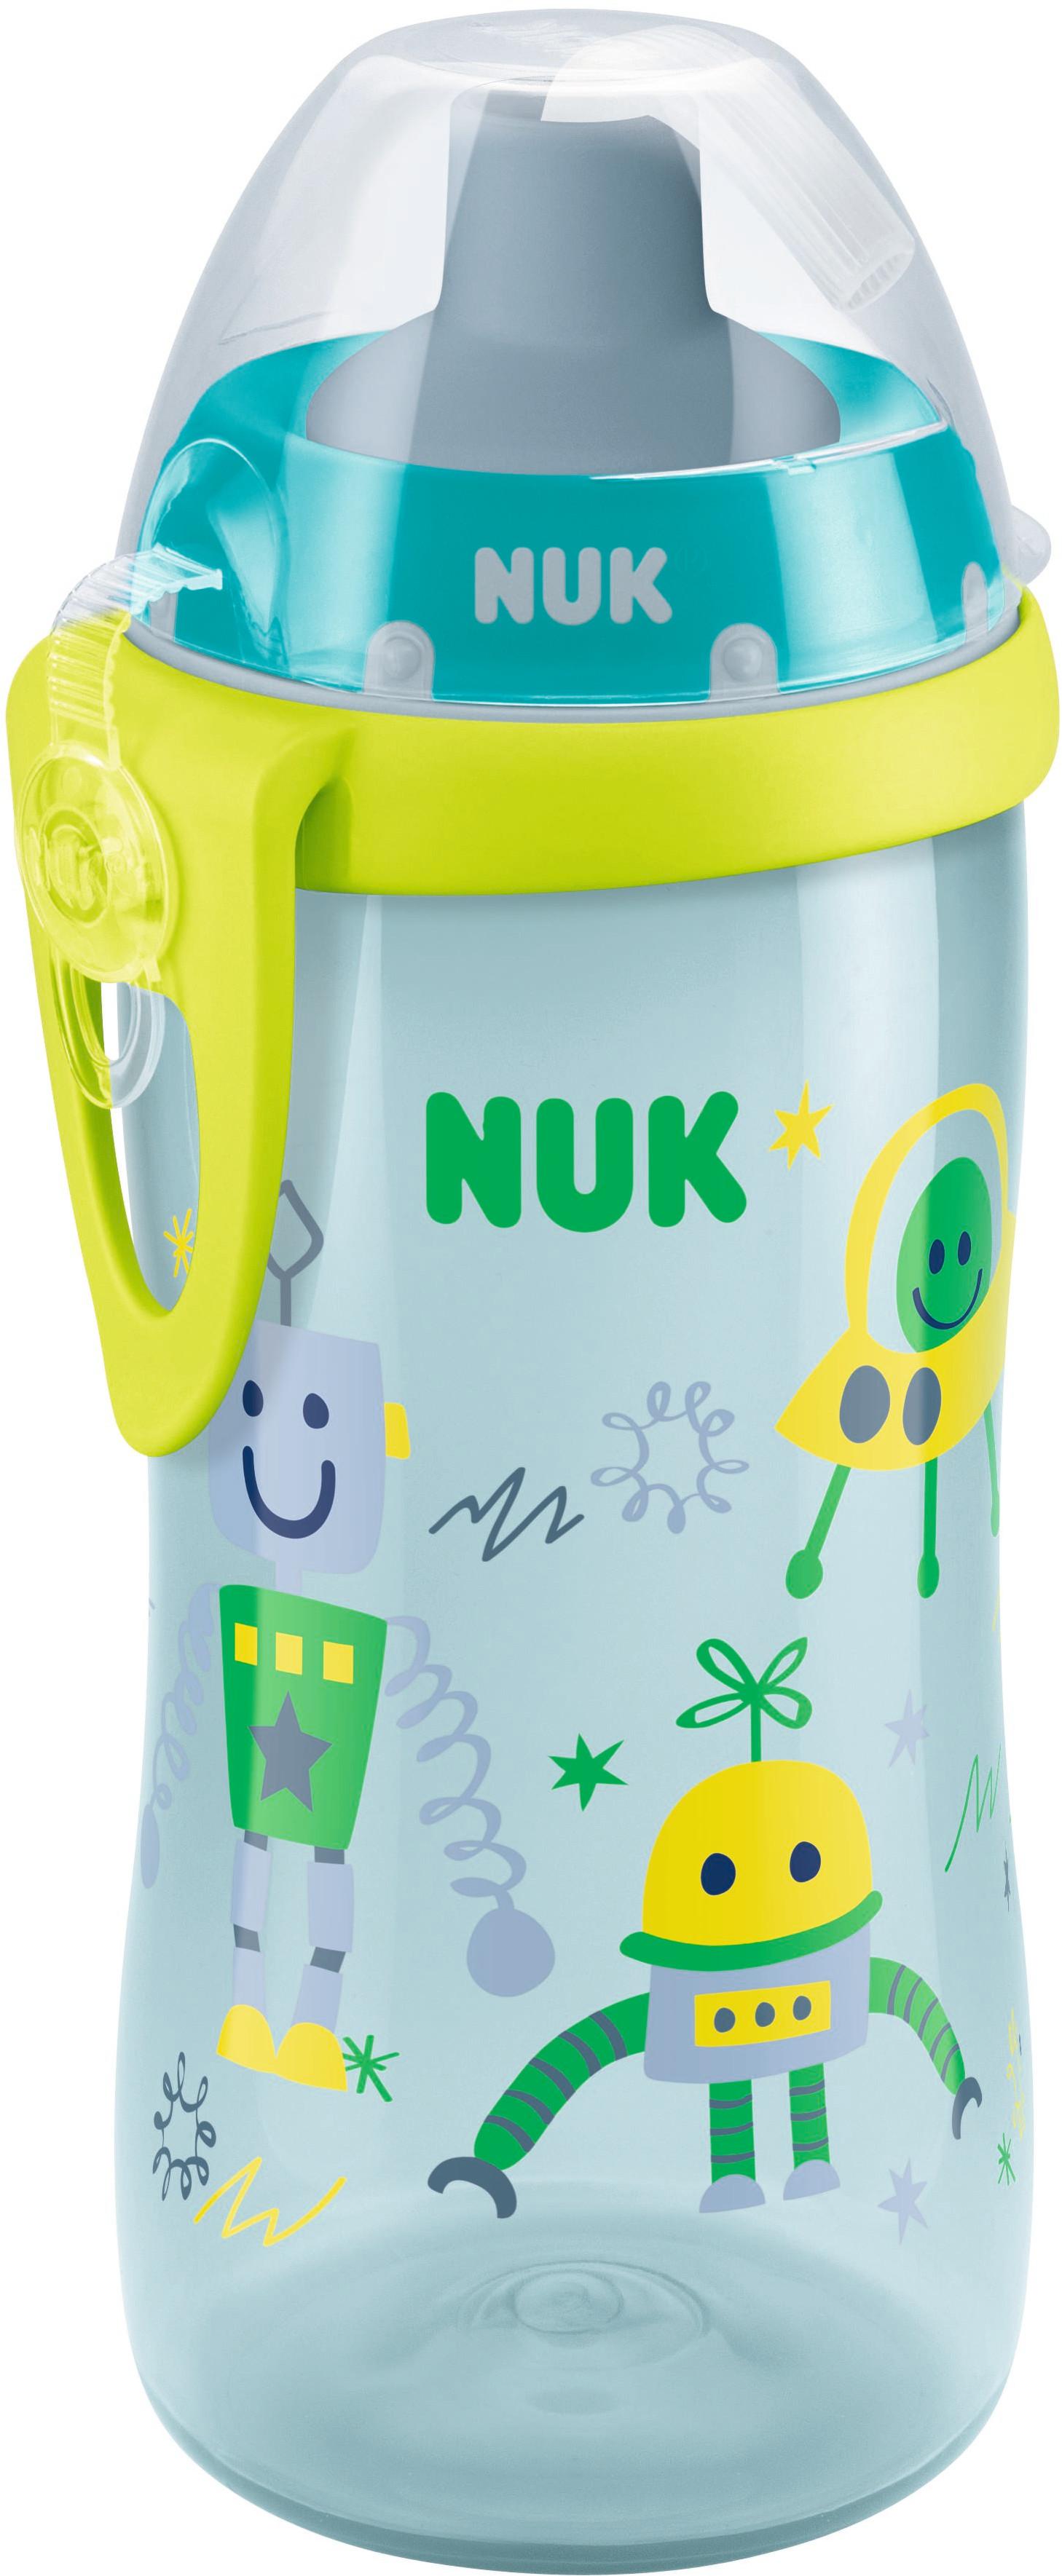 Чашки и поильники NUK First Choice с трубочкой 300 мл бутылочки nuk first choice plus baby blue пластик 300 мл силиконовая соска м